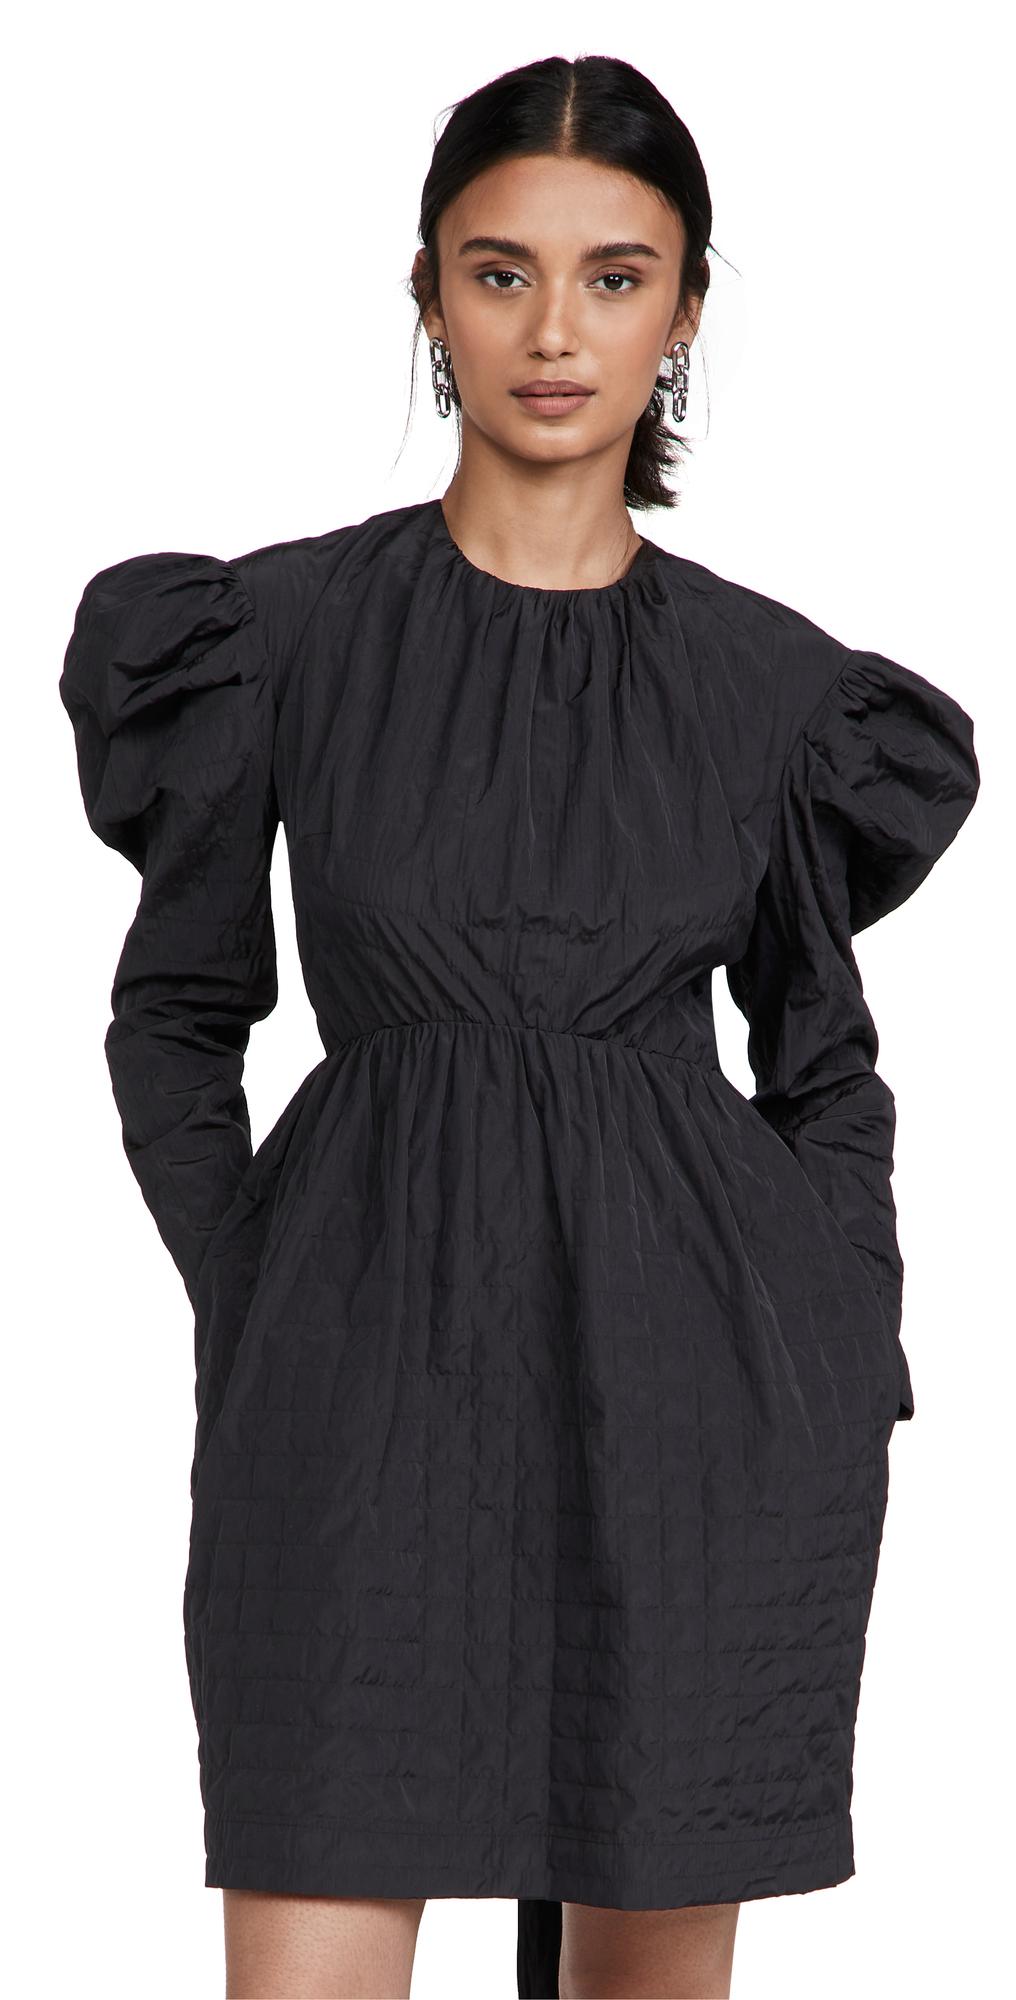 Lykke Mini Dress